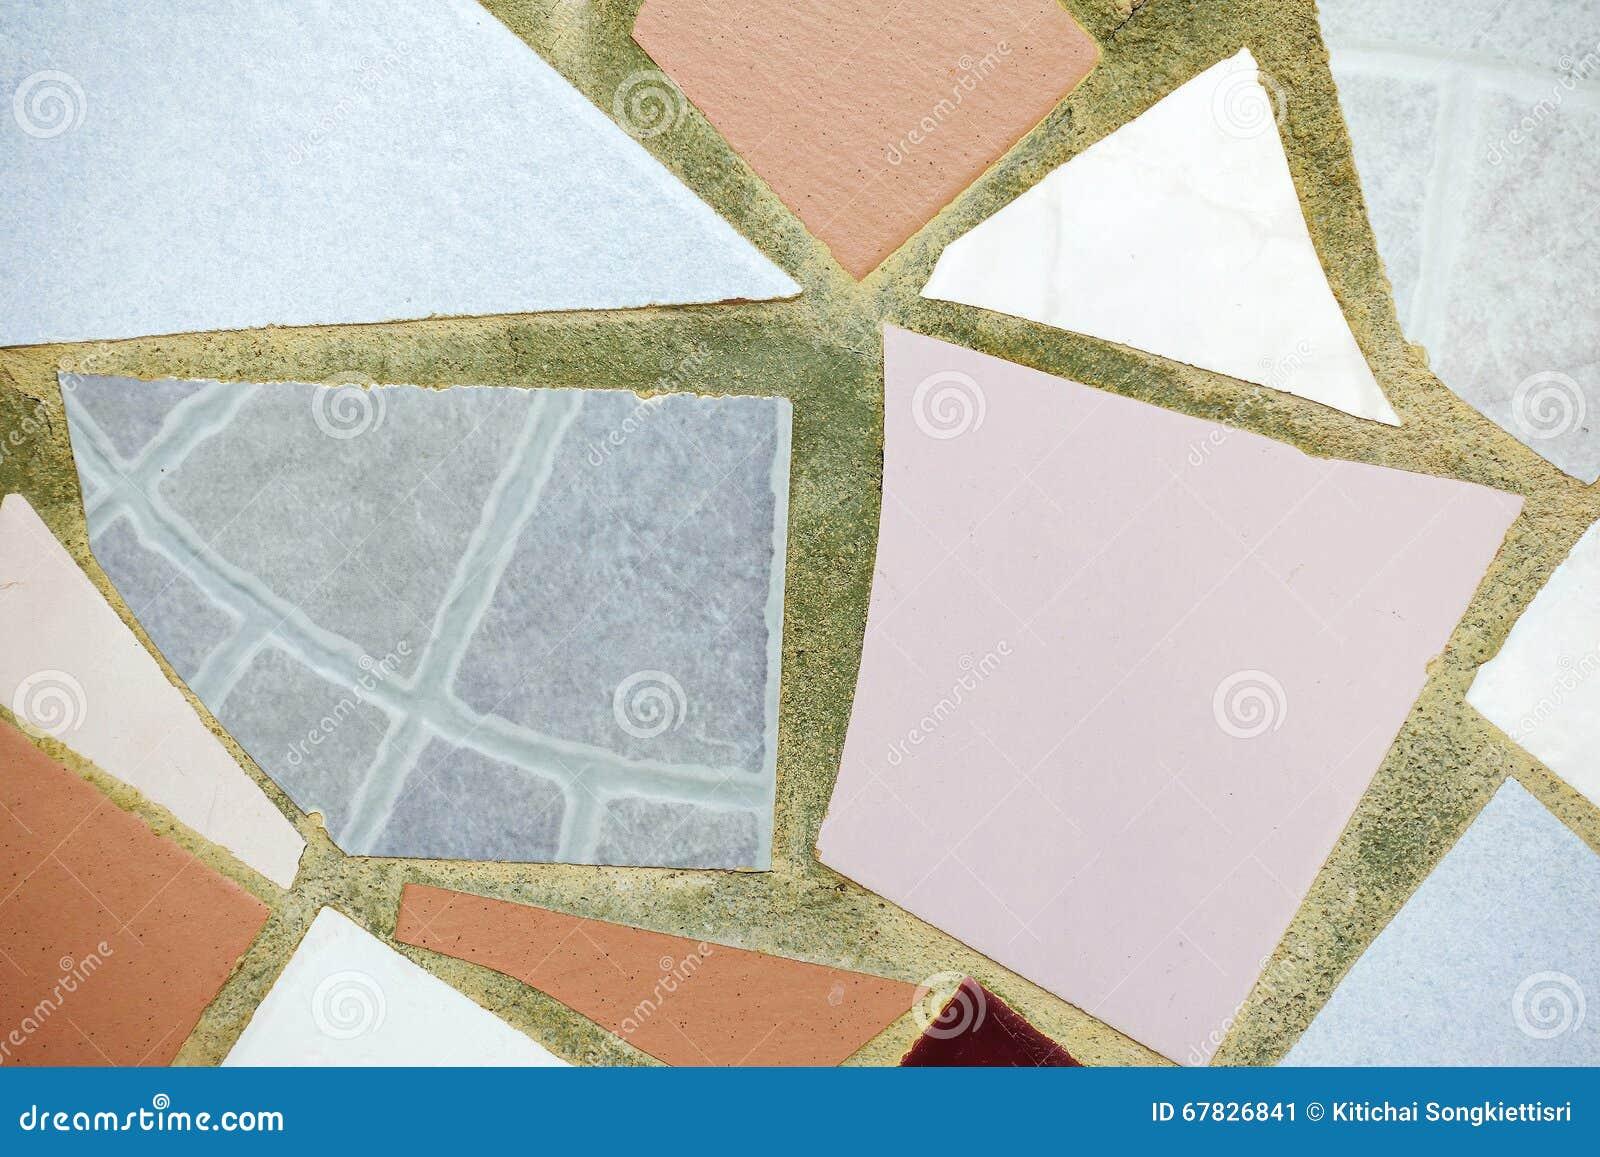 Old Wall Ceramic Tiles Patterns Handcraft For Design Indoor Outdoor ...